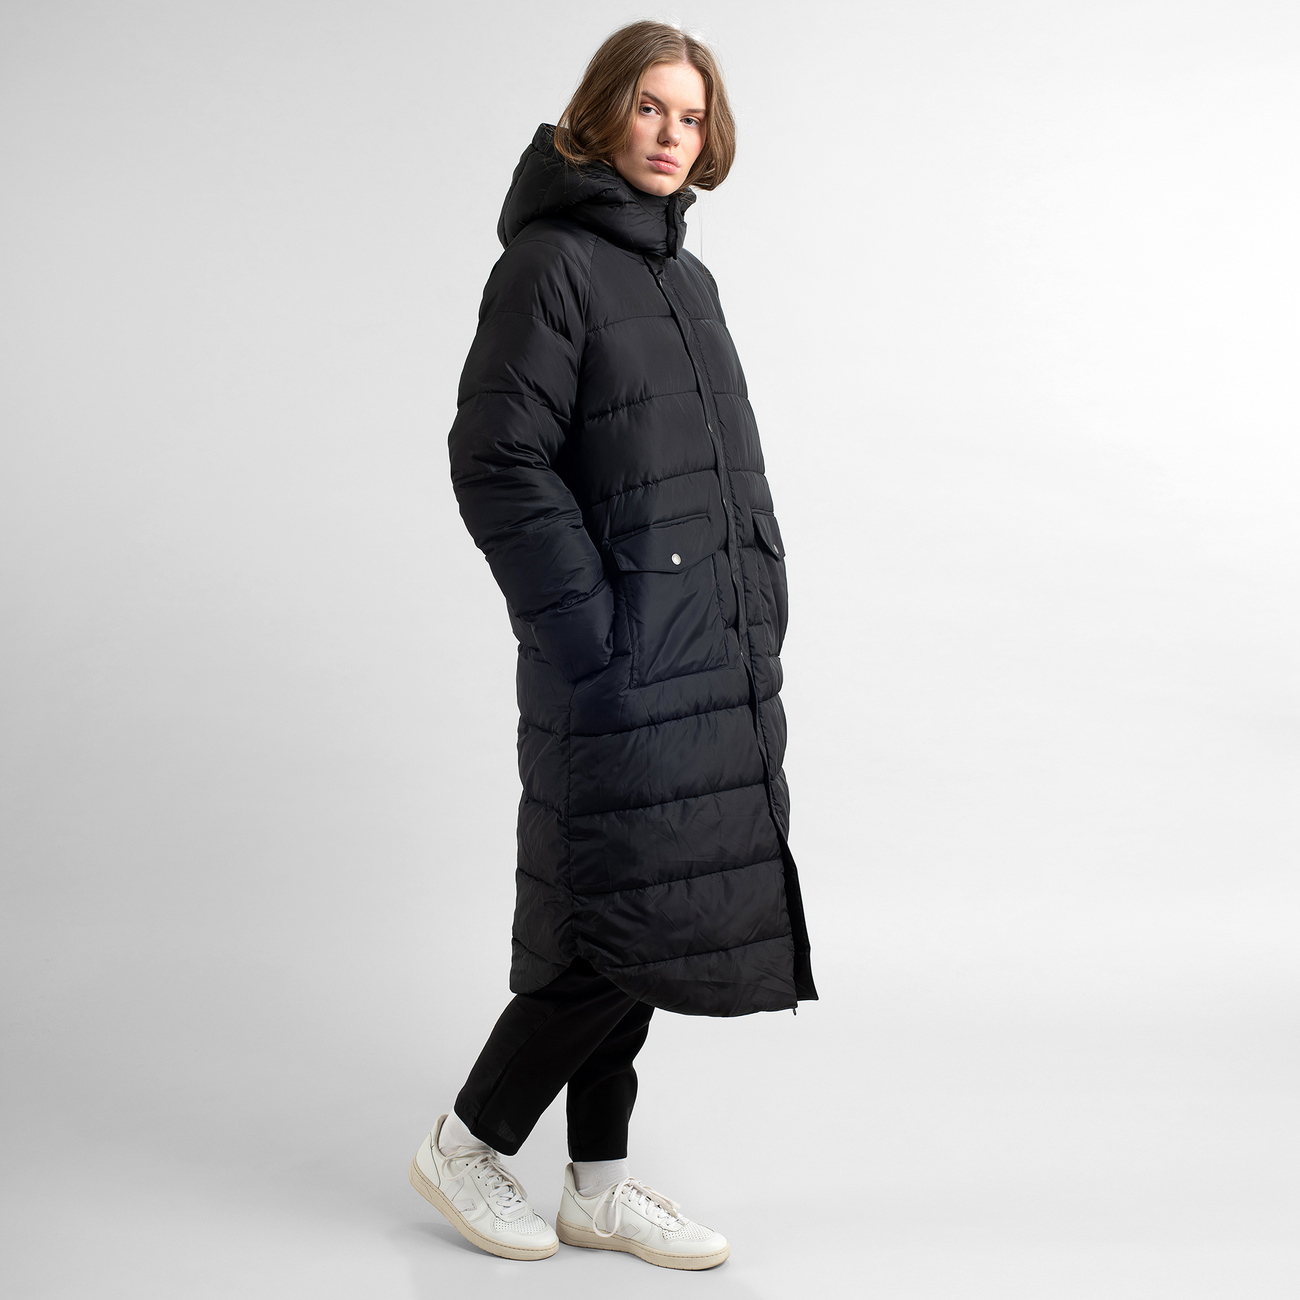 Dedicated Puffer Jacket Haparanda Black